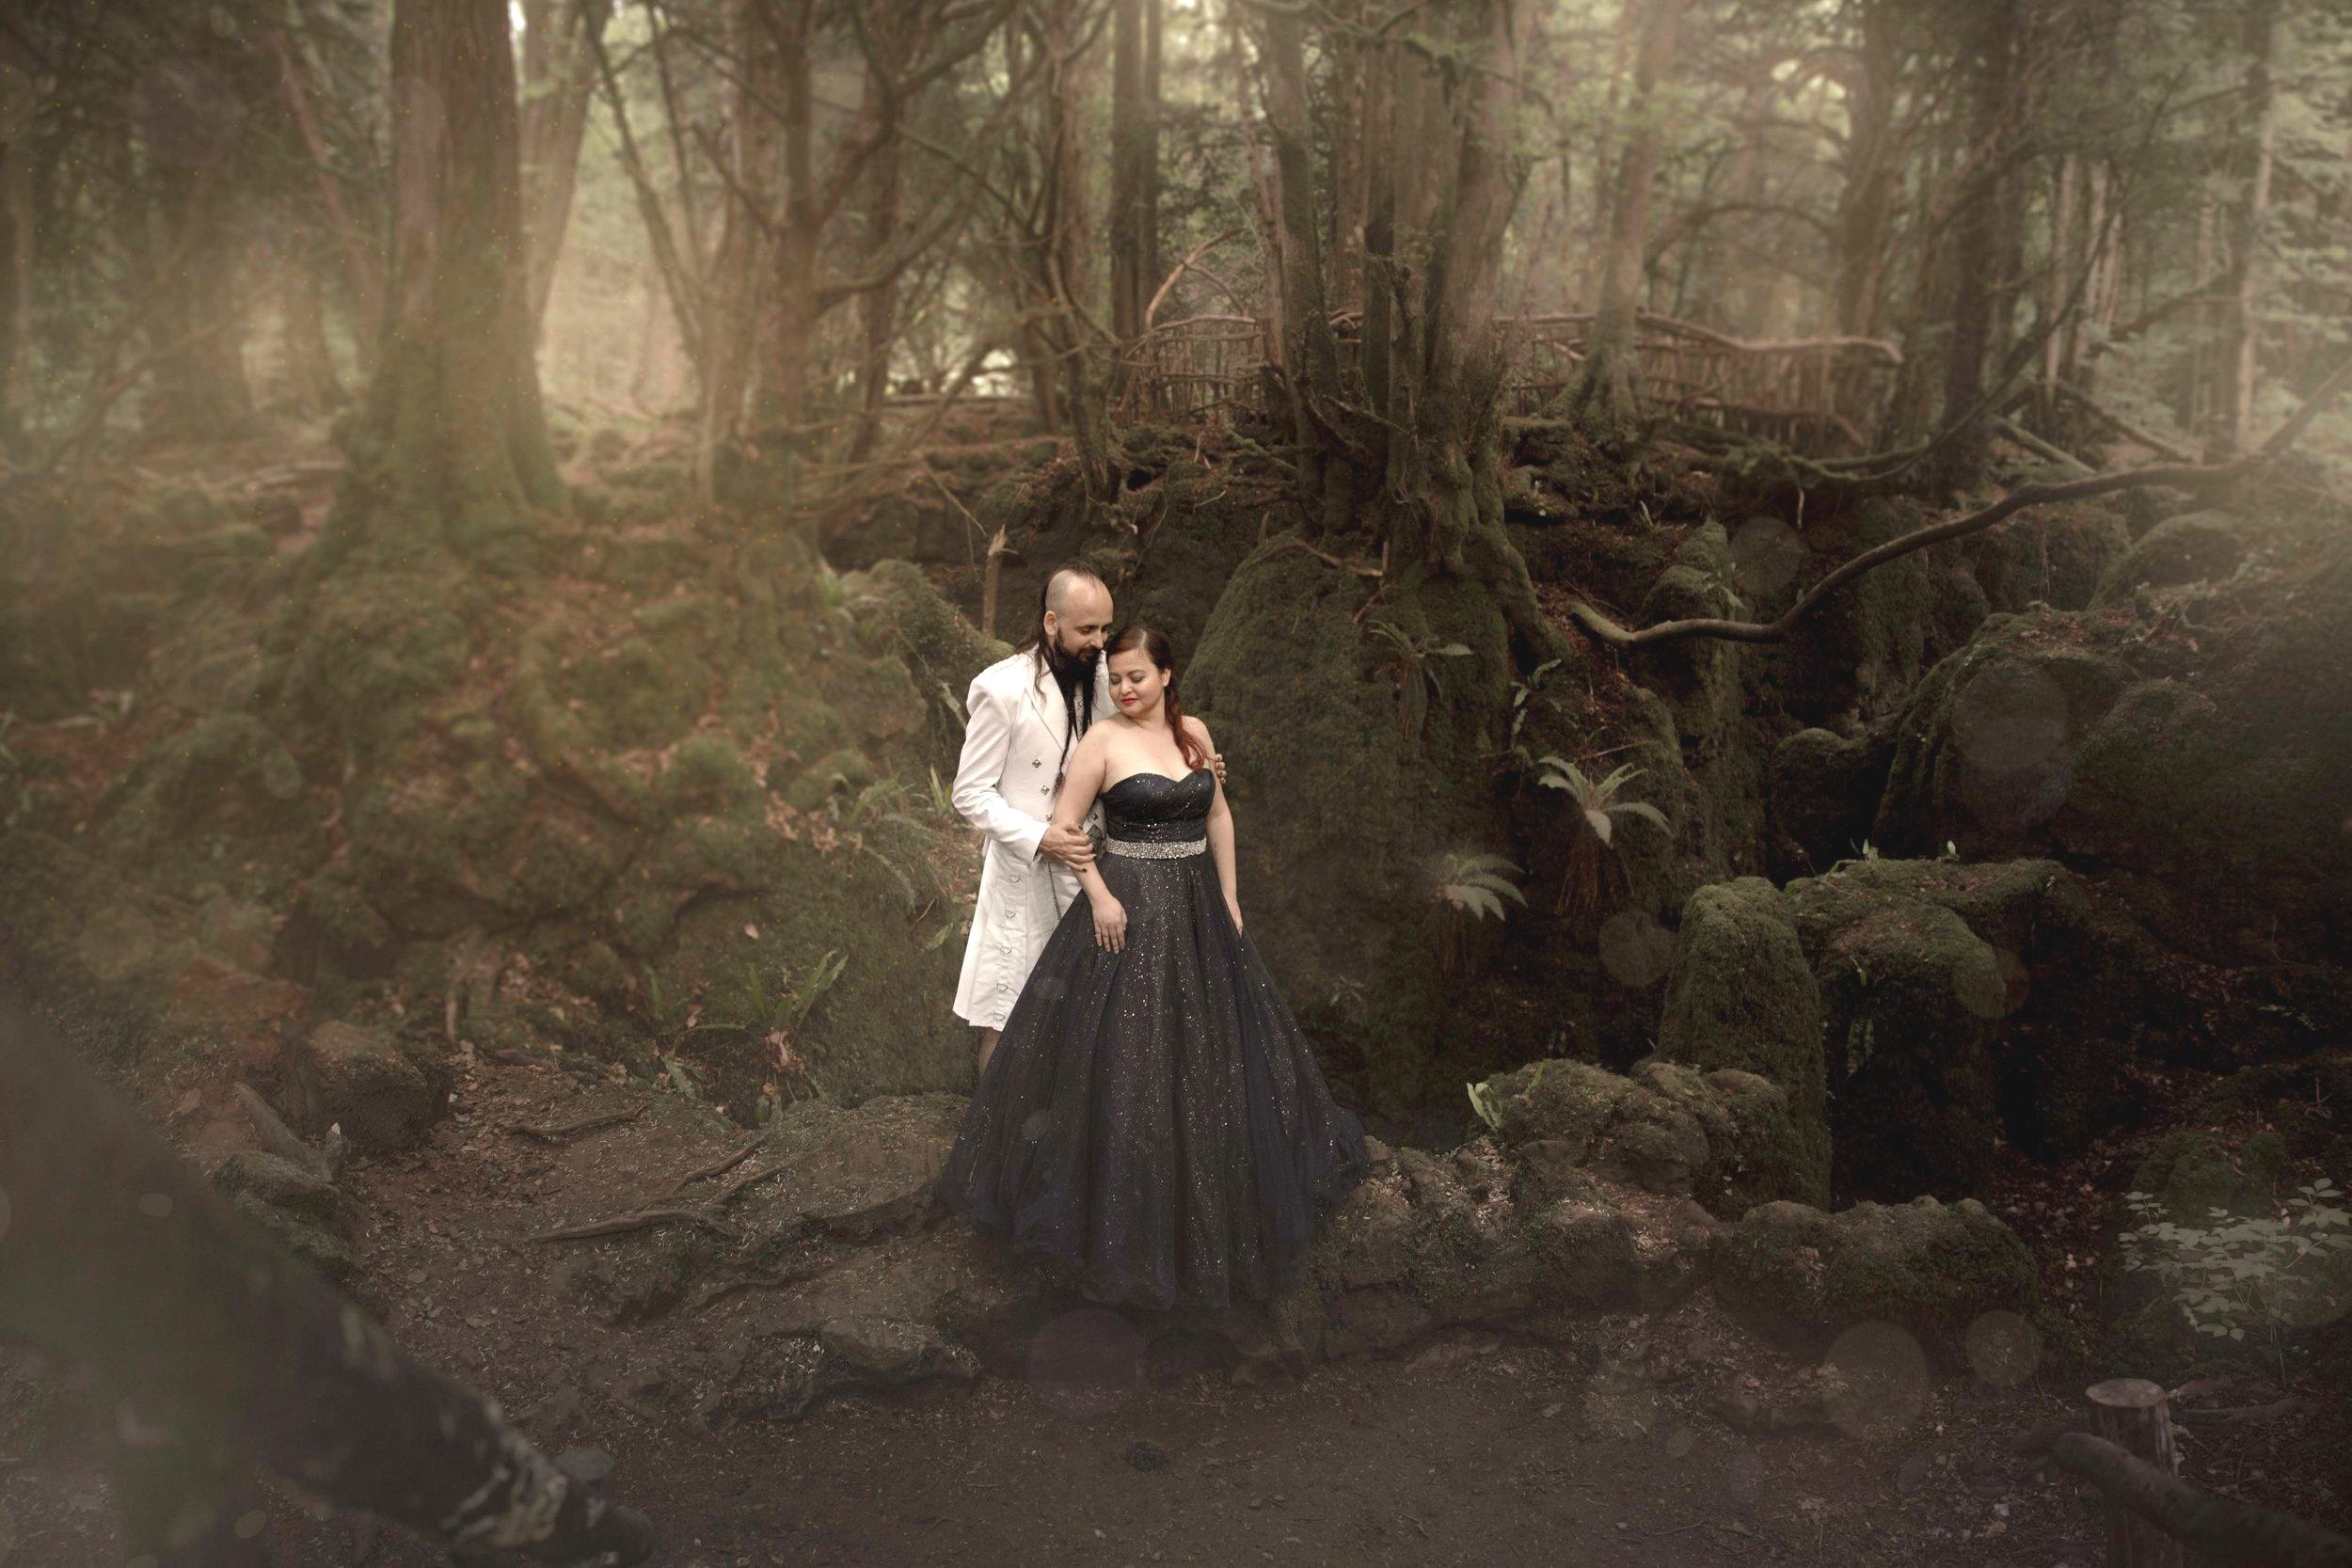 Puzzlewood-prewedding-photoshoot.jpg